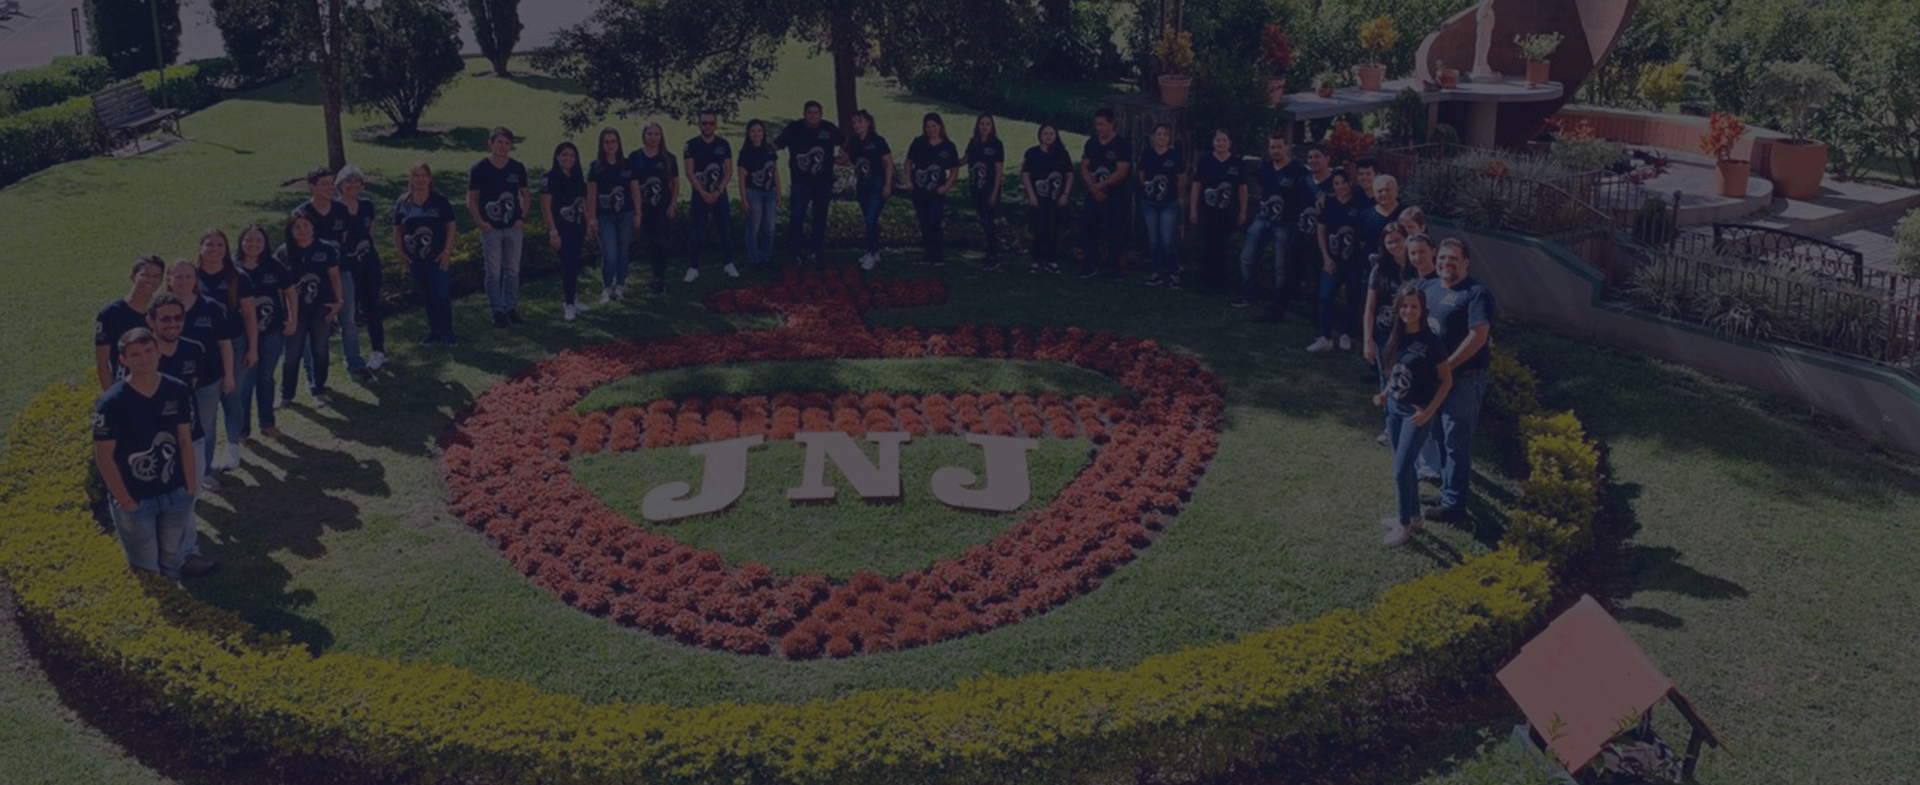 Seminario Corazonista